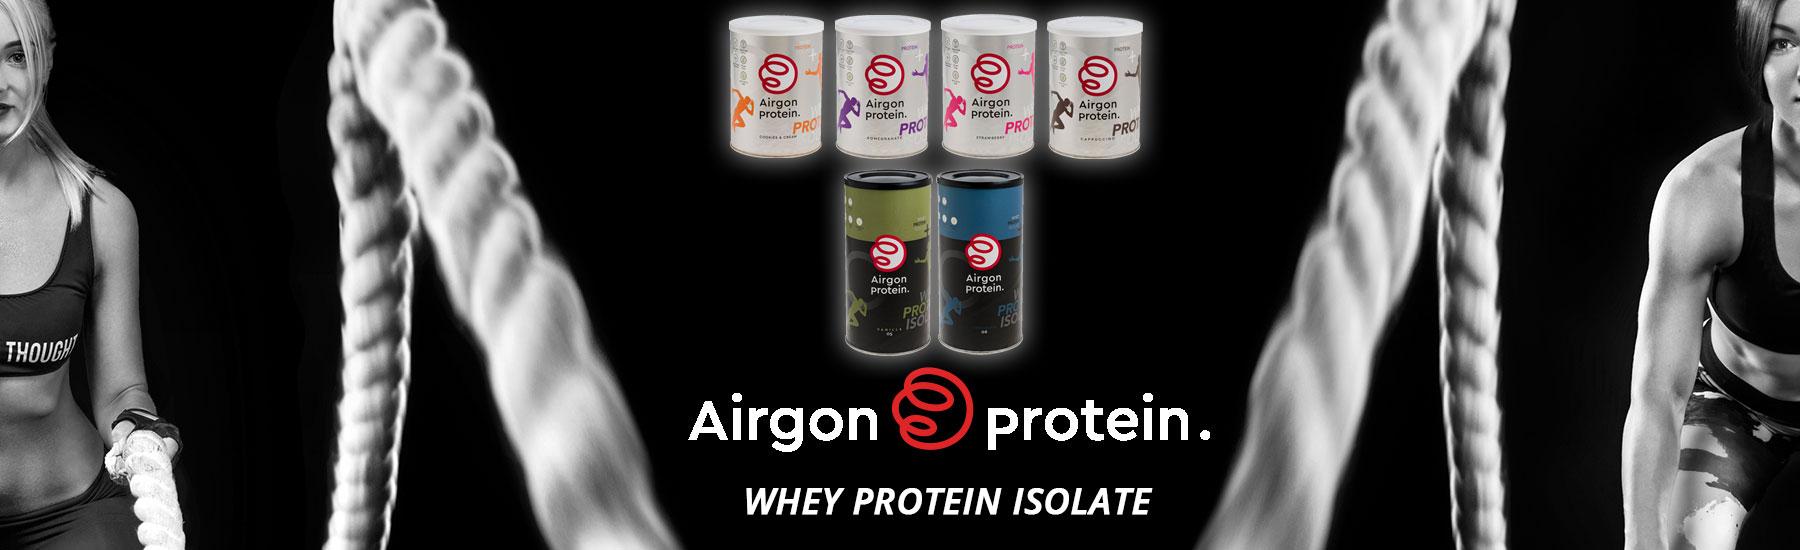 Airgon Protein.